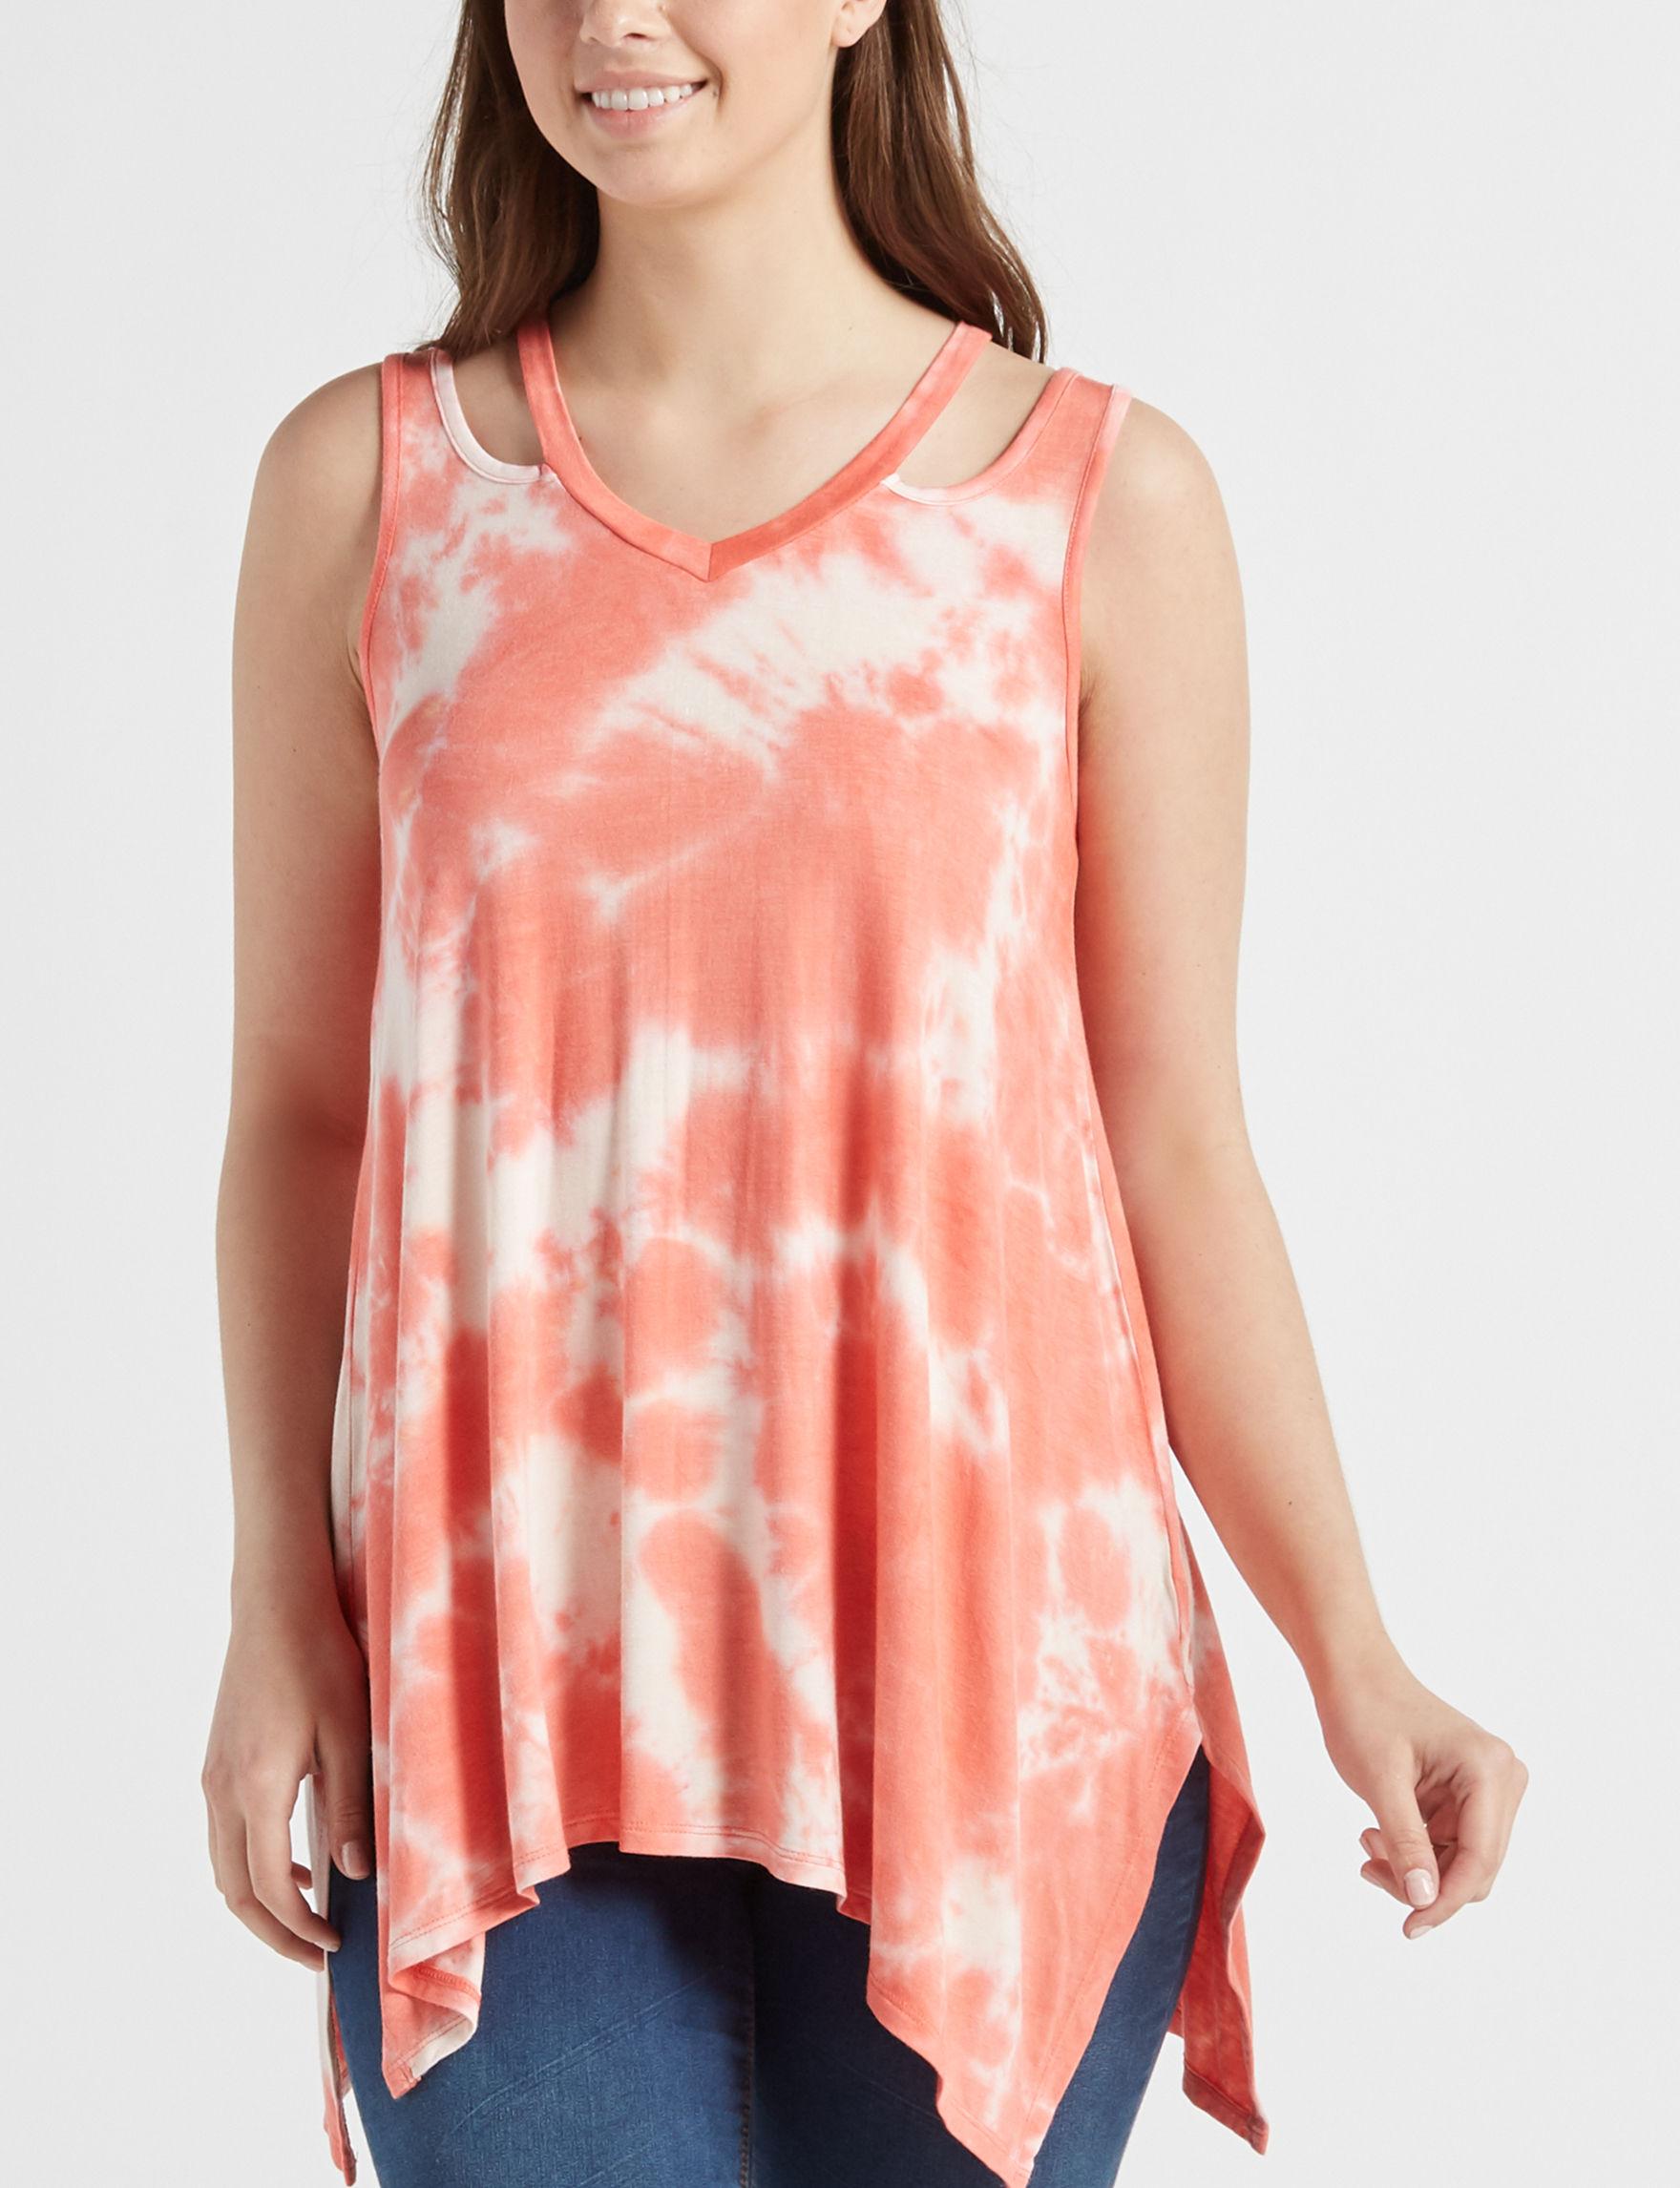 Signature Studio Orange Shirts & Blouses Tees & Tanks